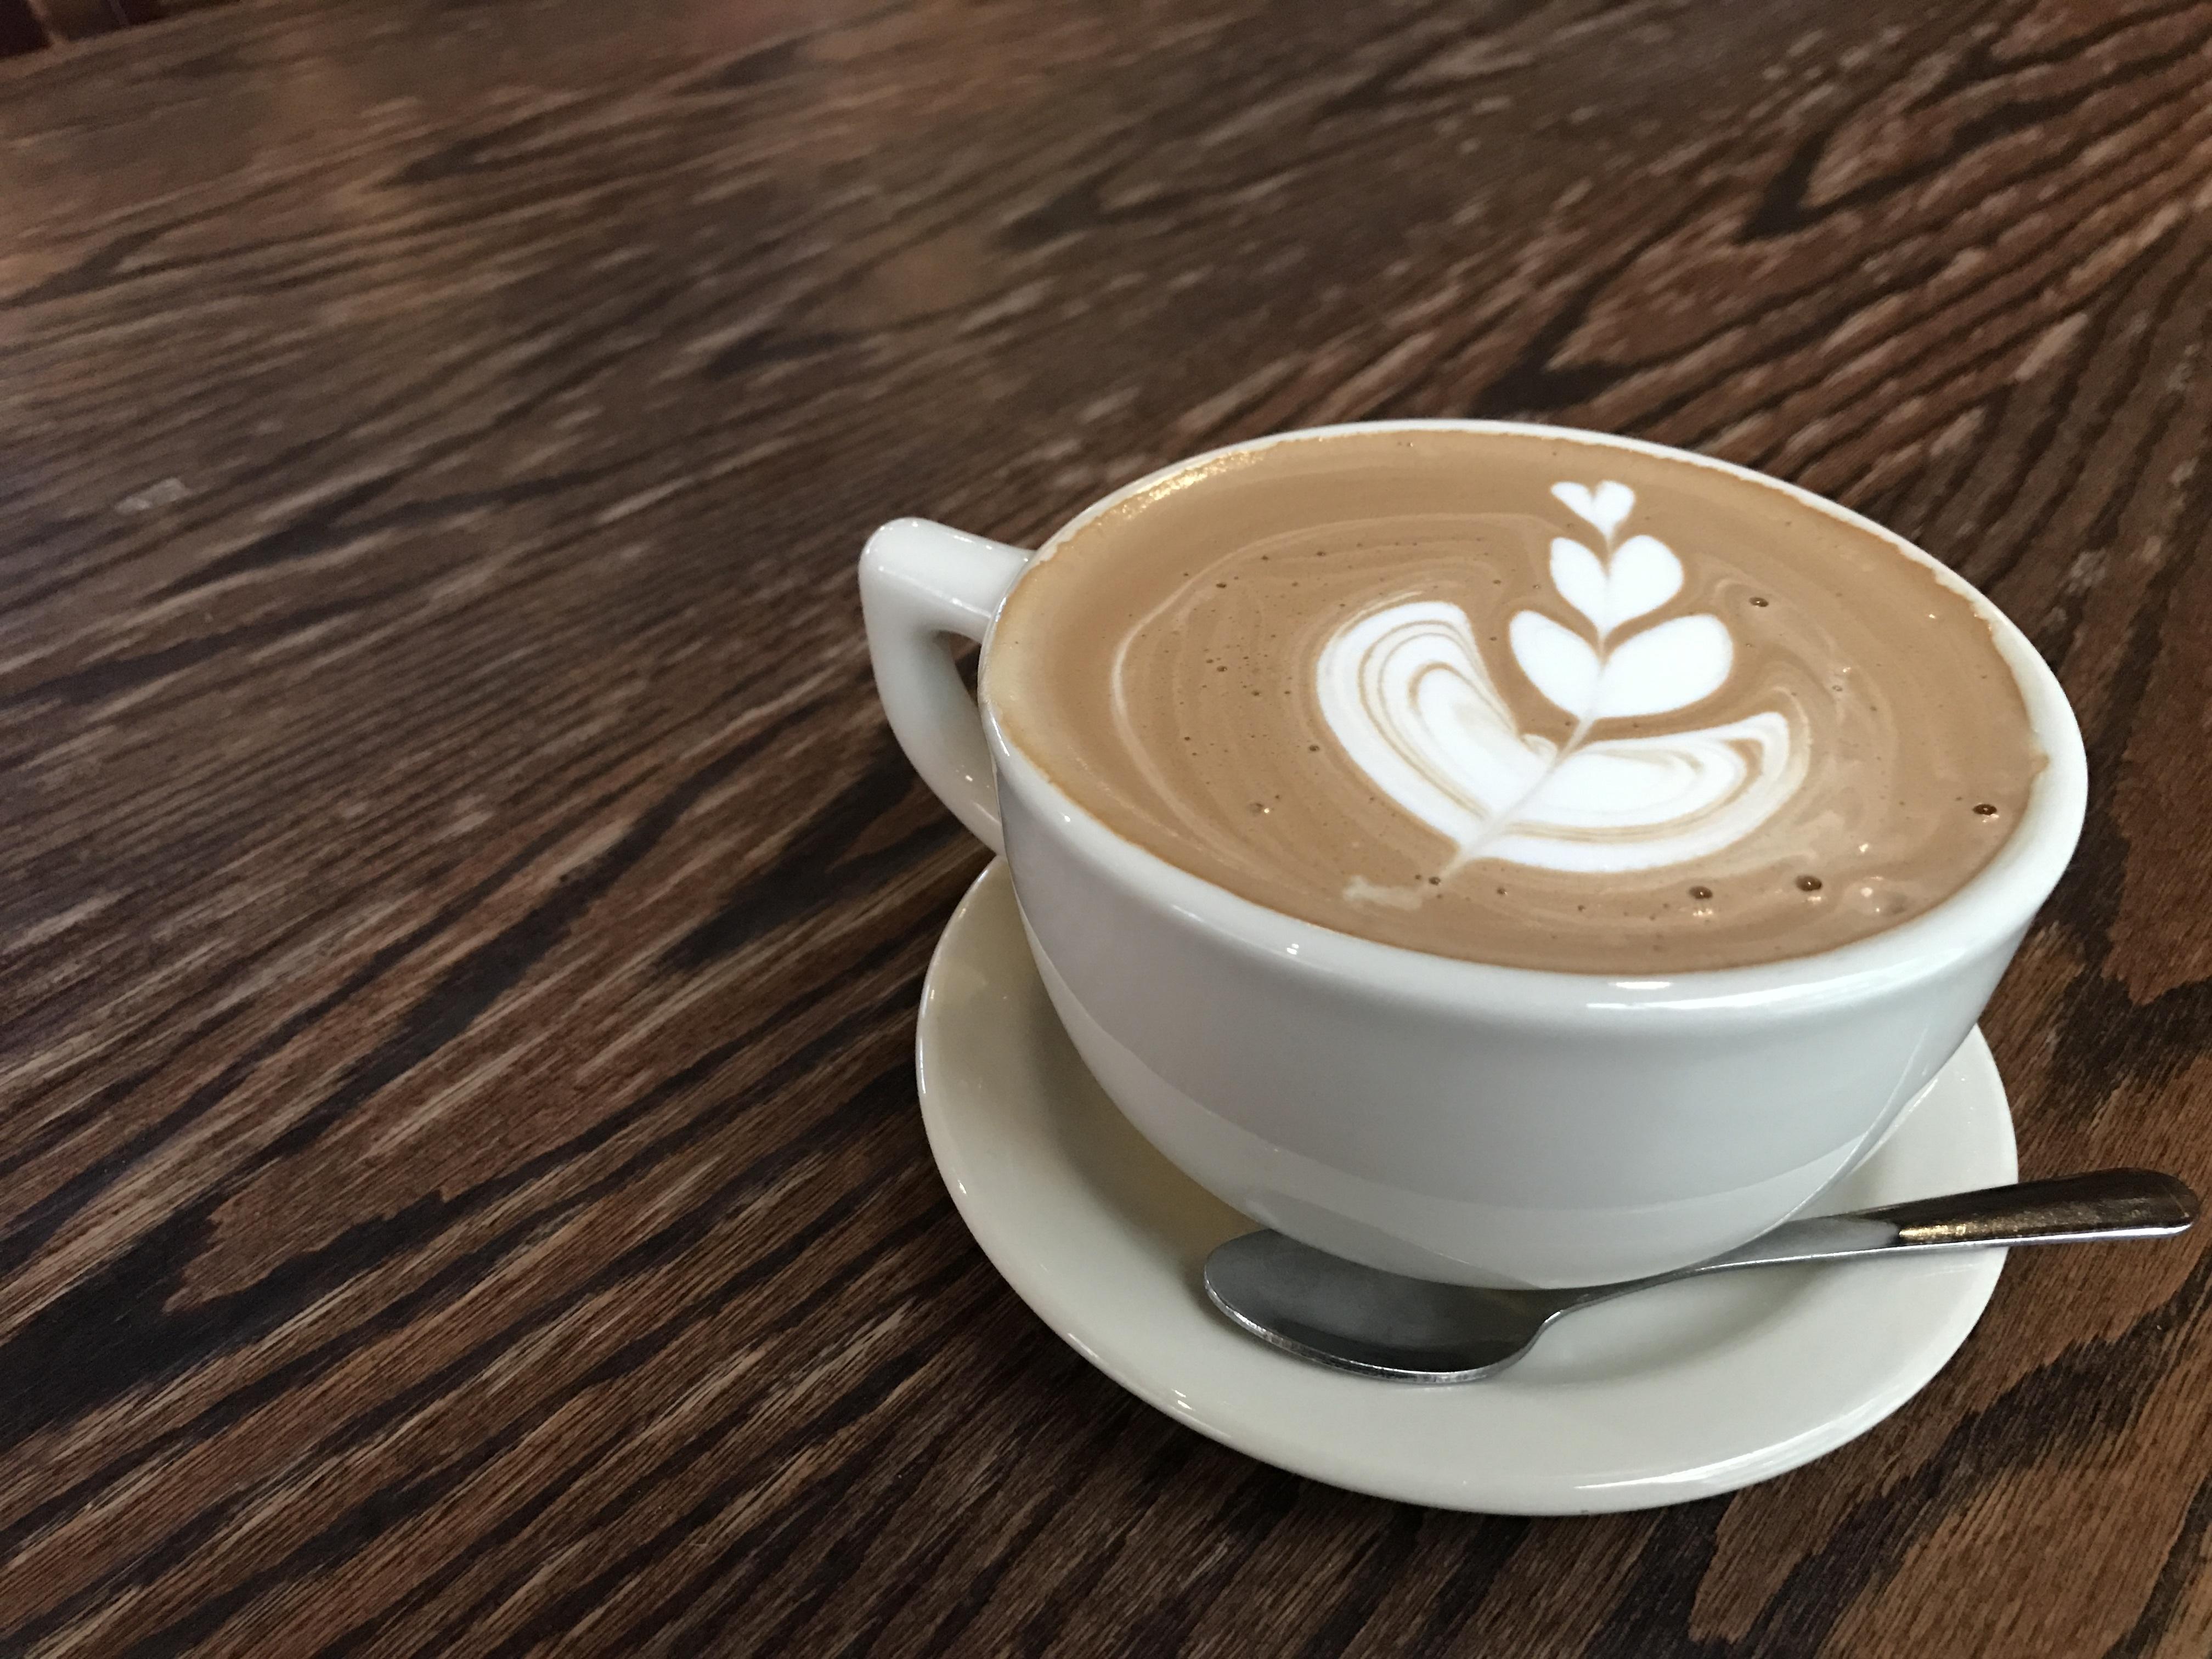 fotos gratis vaso latt capuchino relajarse beber caf expr s taza de caf cafe na. Black Bedroom Furniture Sets. Home Design Ideas